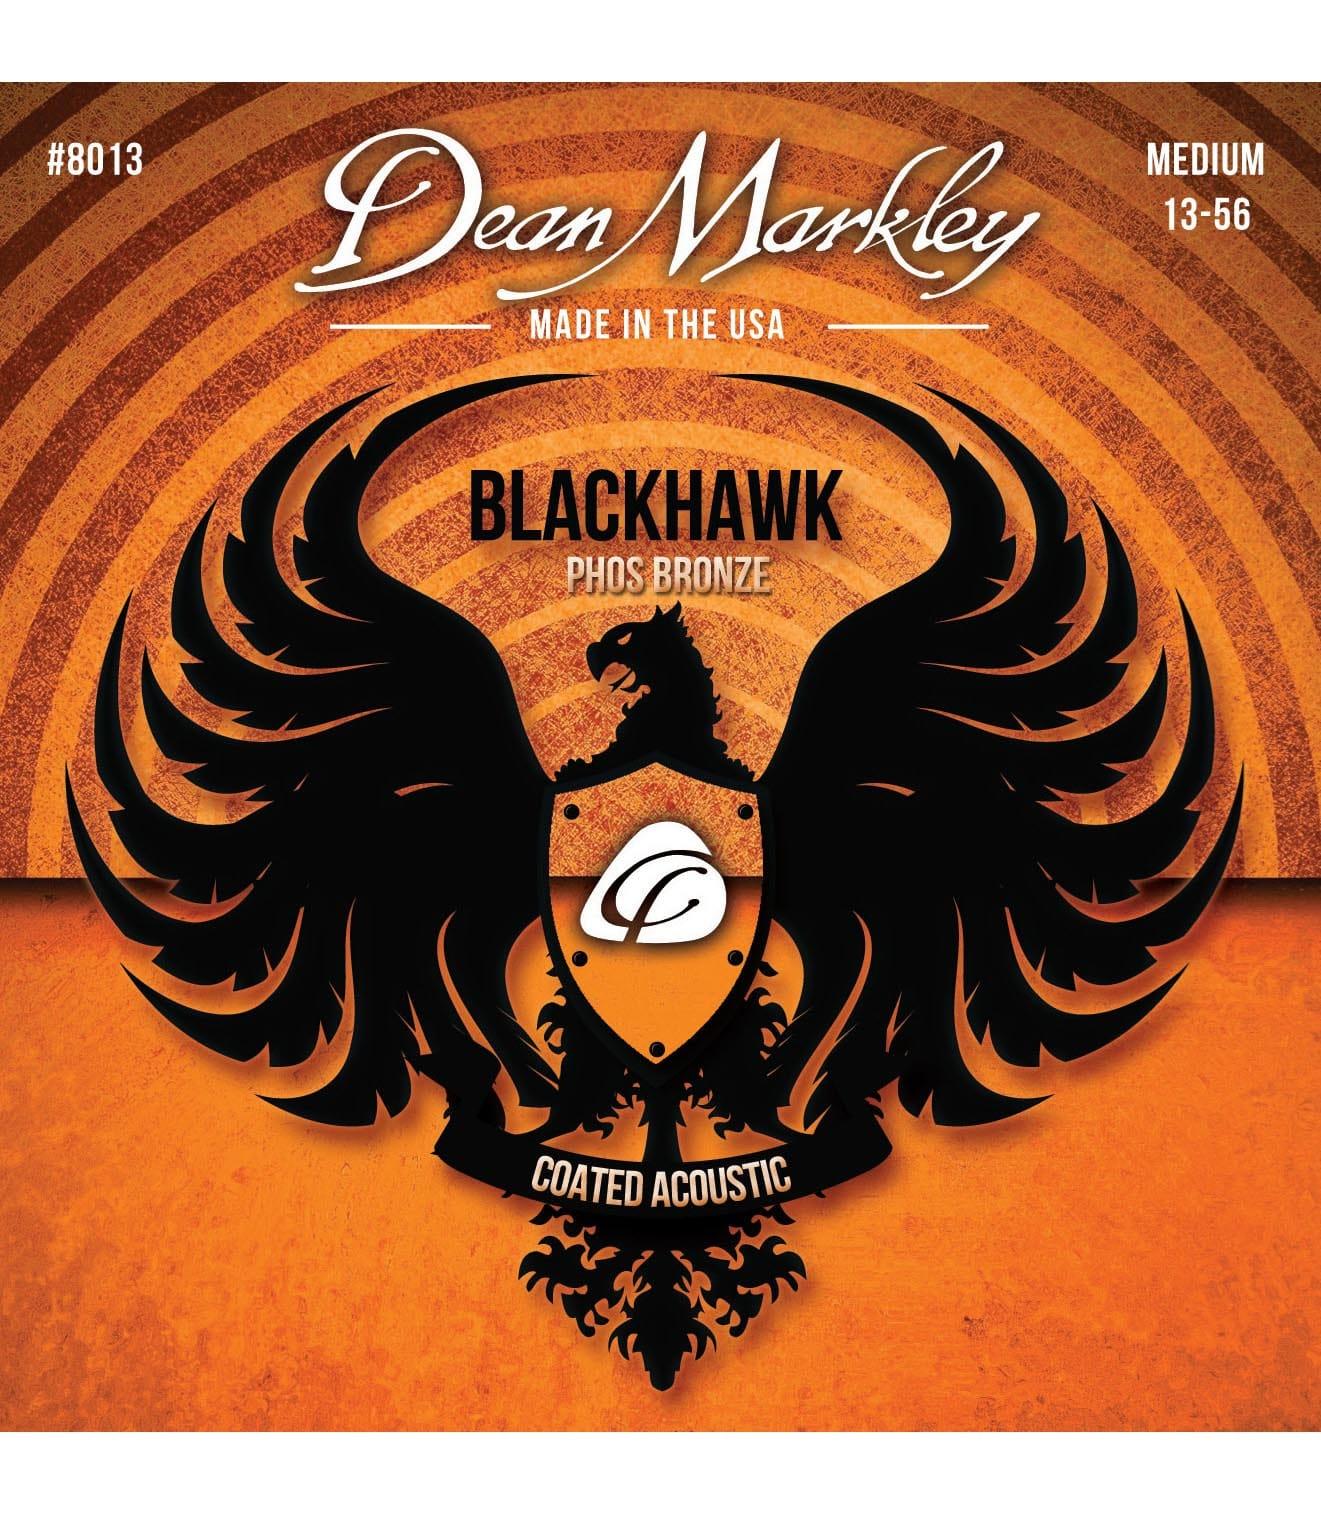 buy deanmarkley 8013pure bronze medium 13 56